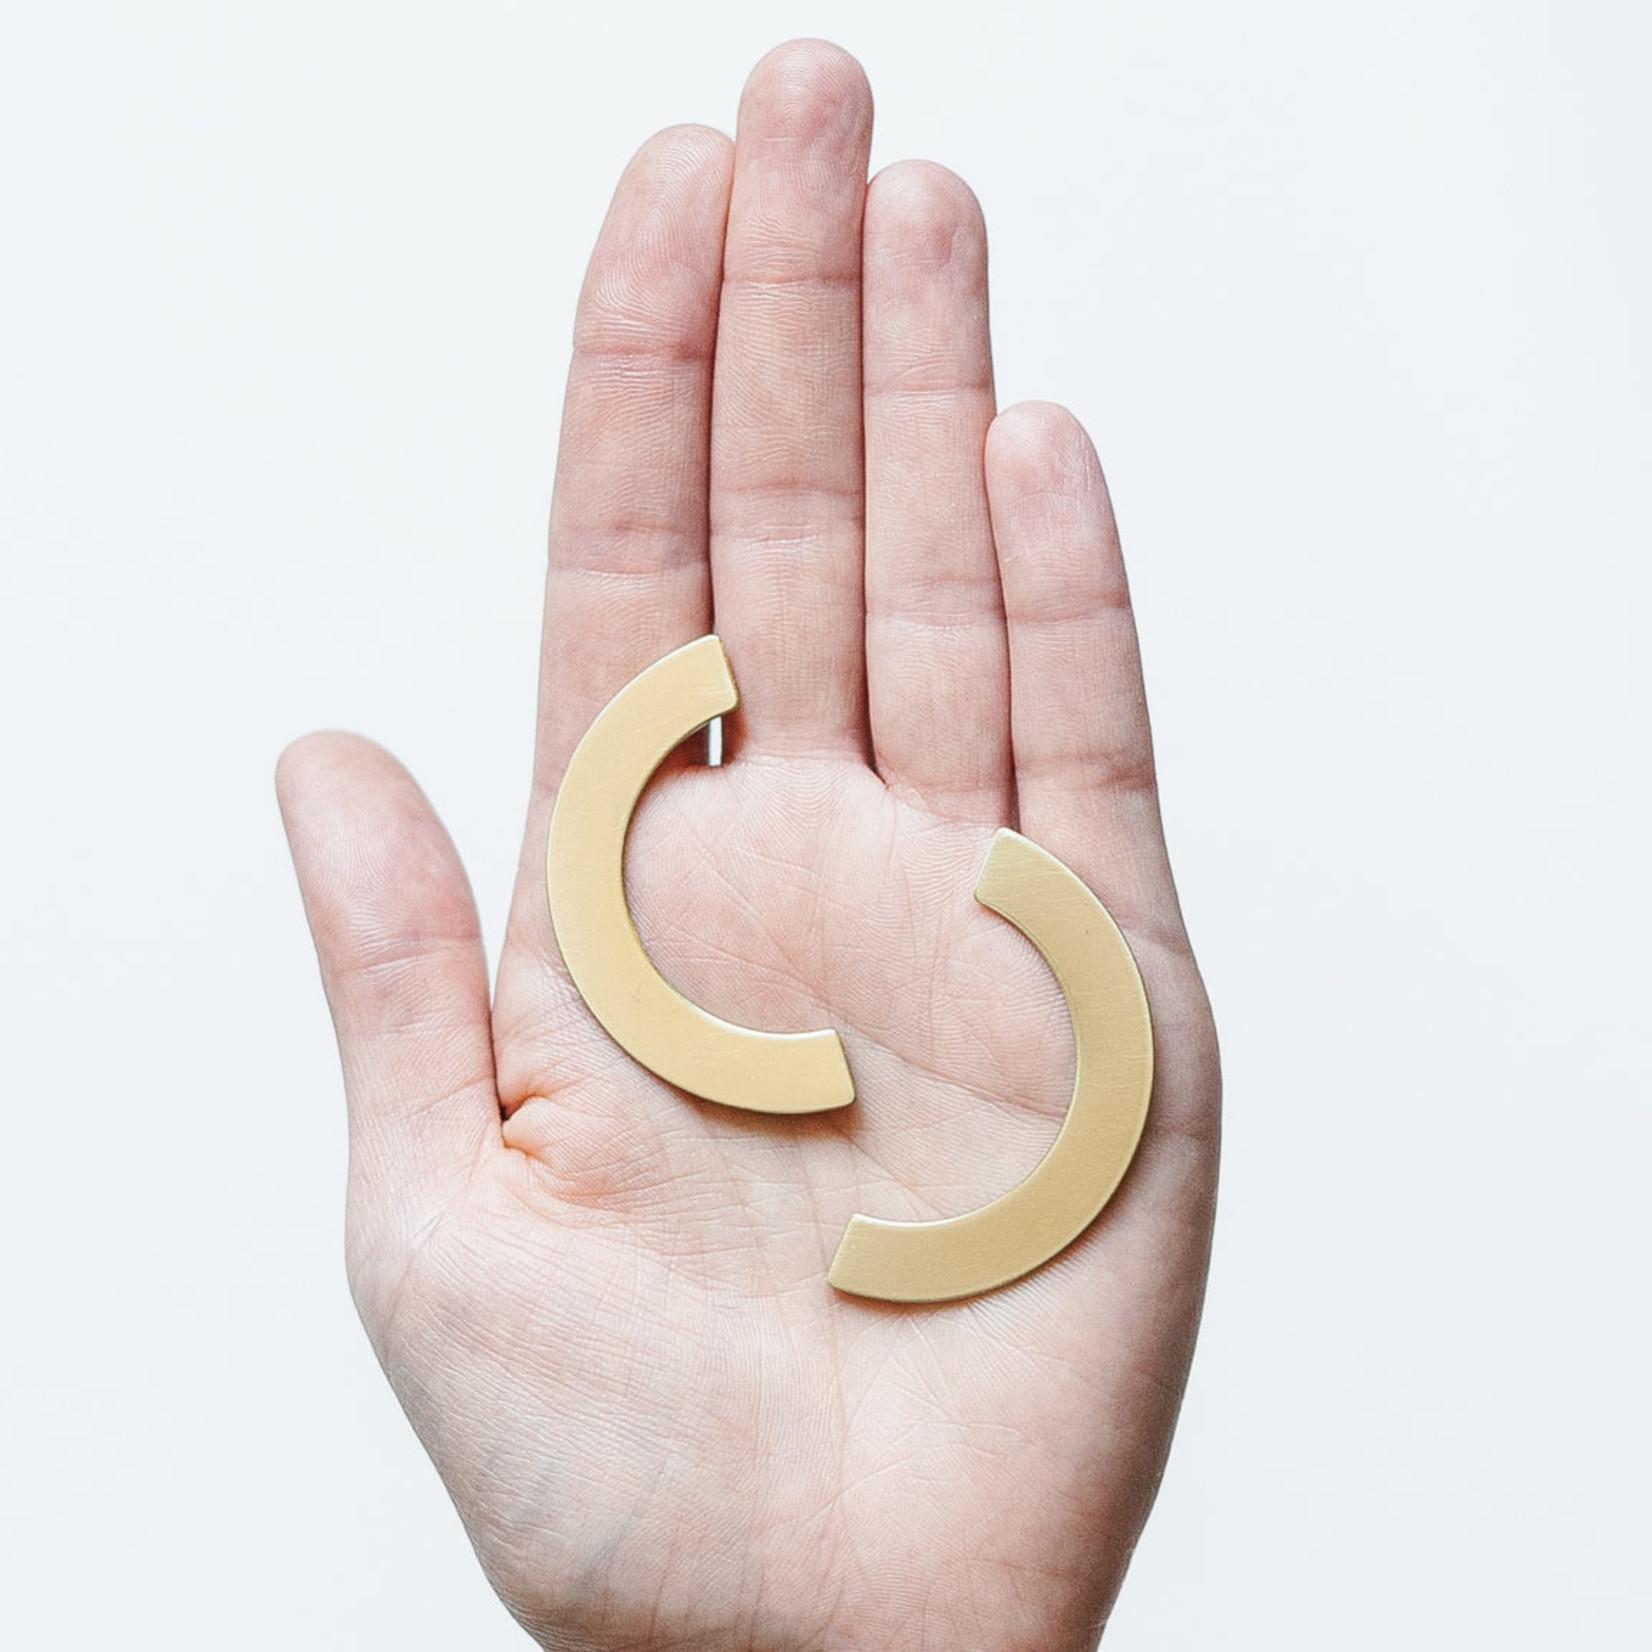 Inimini Homemade Oorbellen - Brass - Big rounded studs